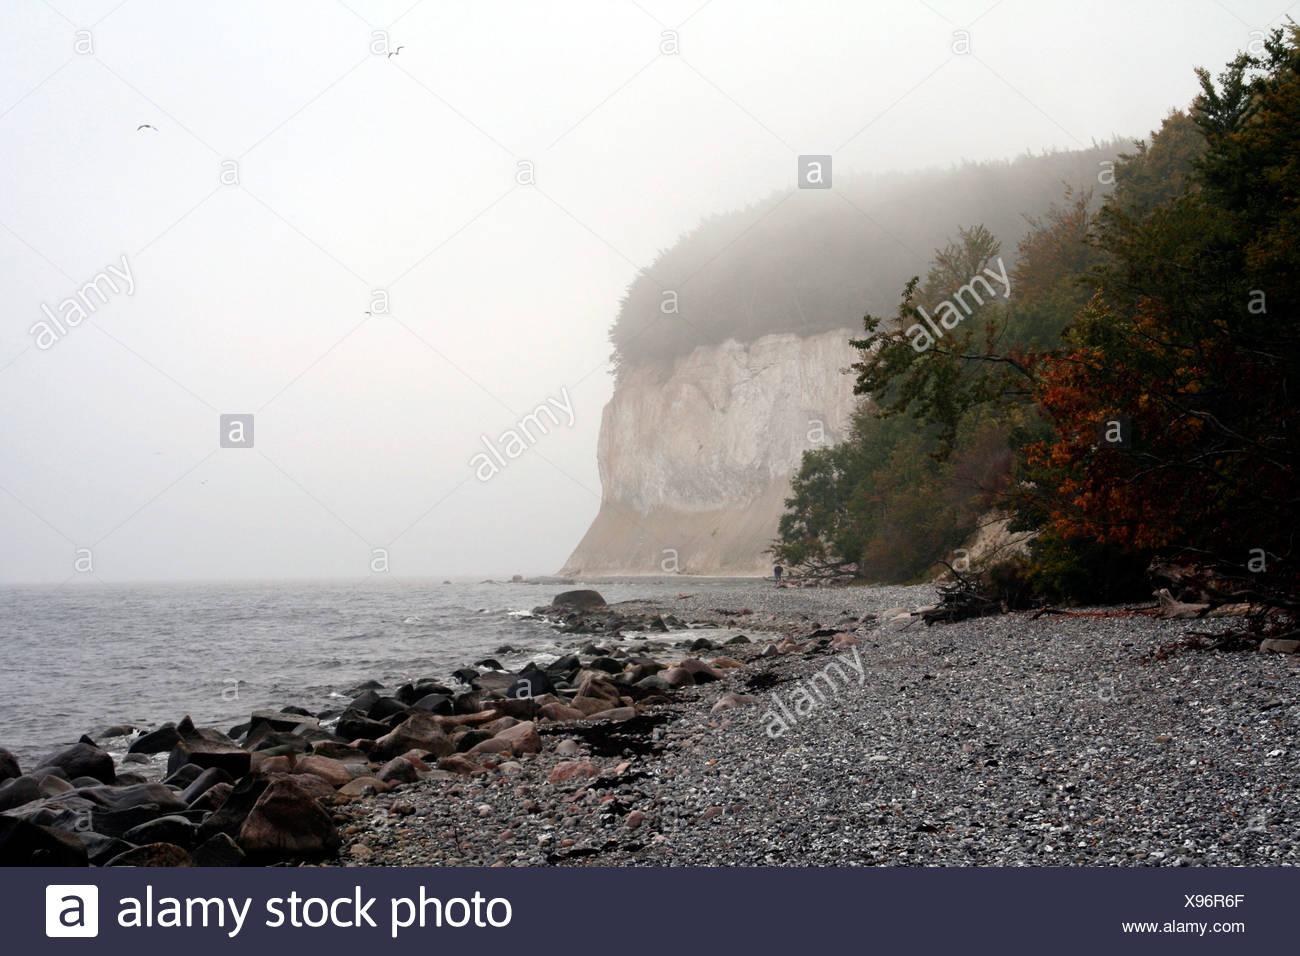 Ruegen Island, Kreidekueste, Chalk Coast, Mecklenburg-Western Pomerania, Germany, Europe Stock Photo